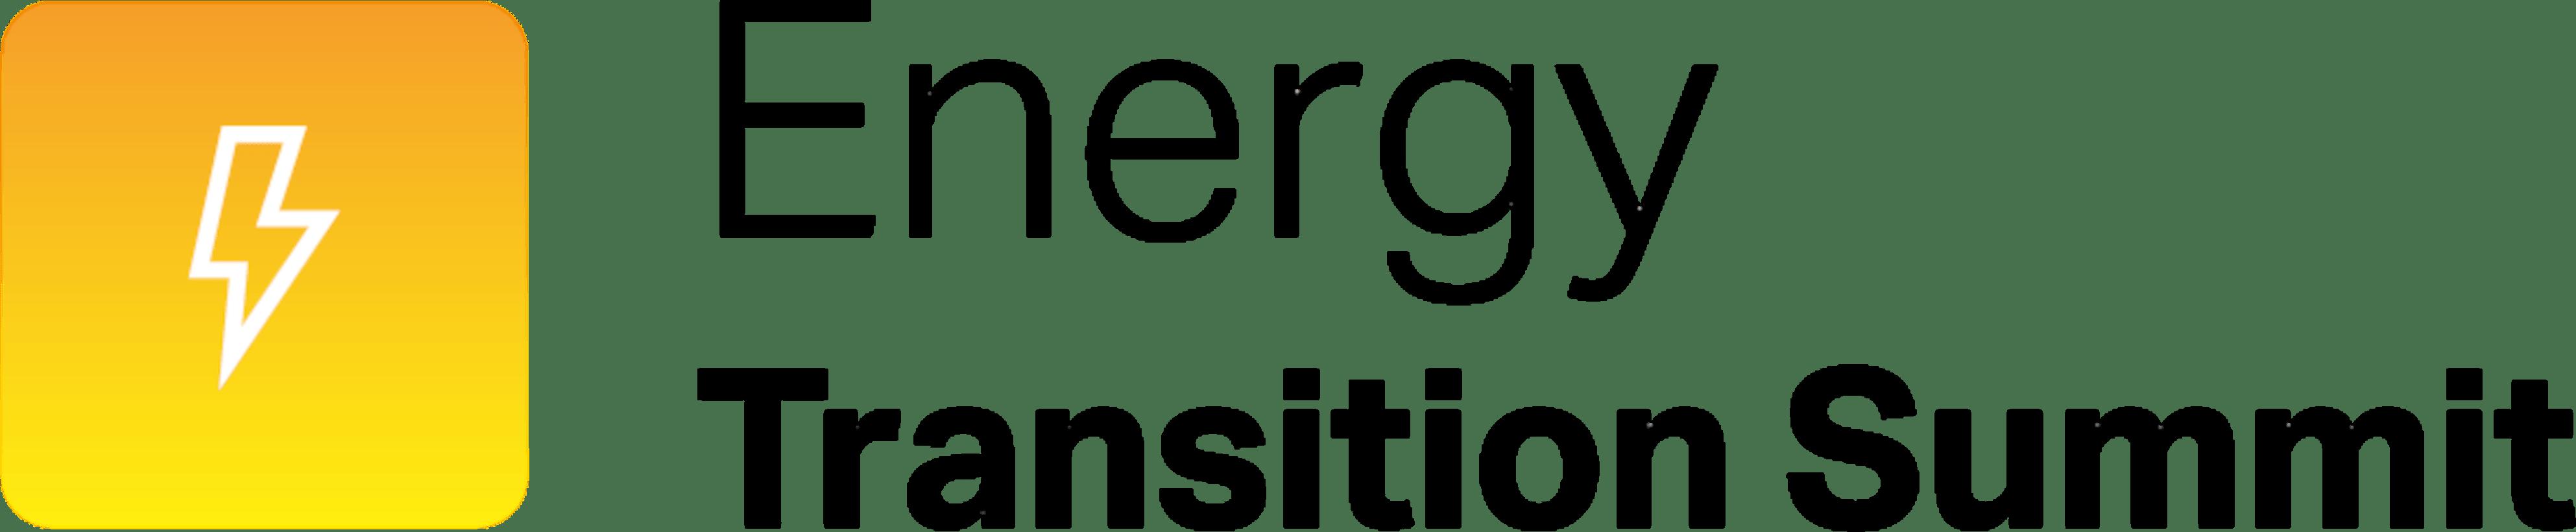 Energy – Transition Summit